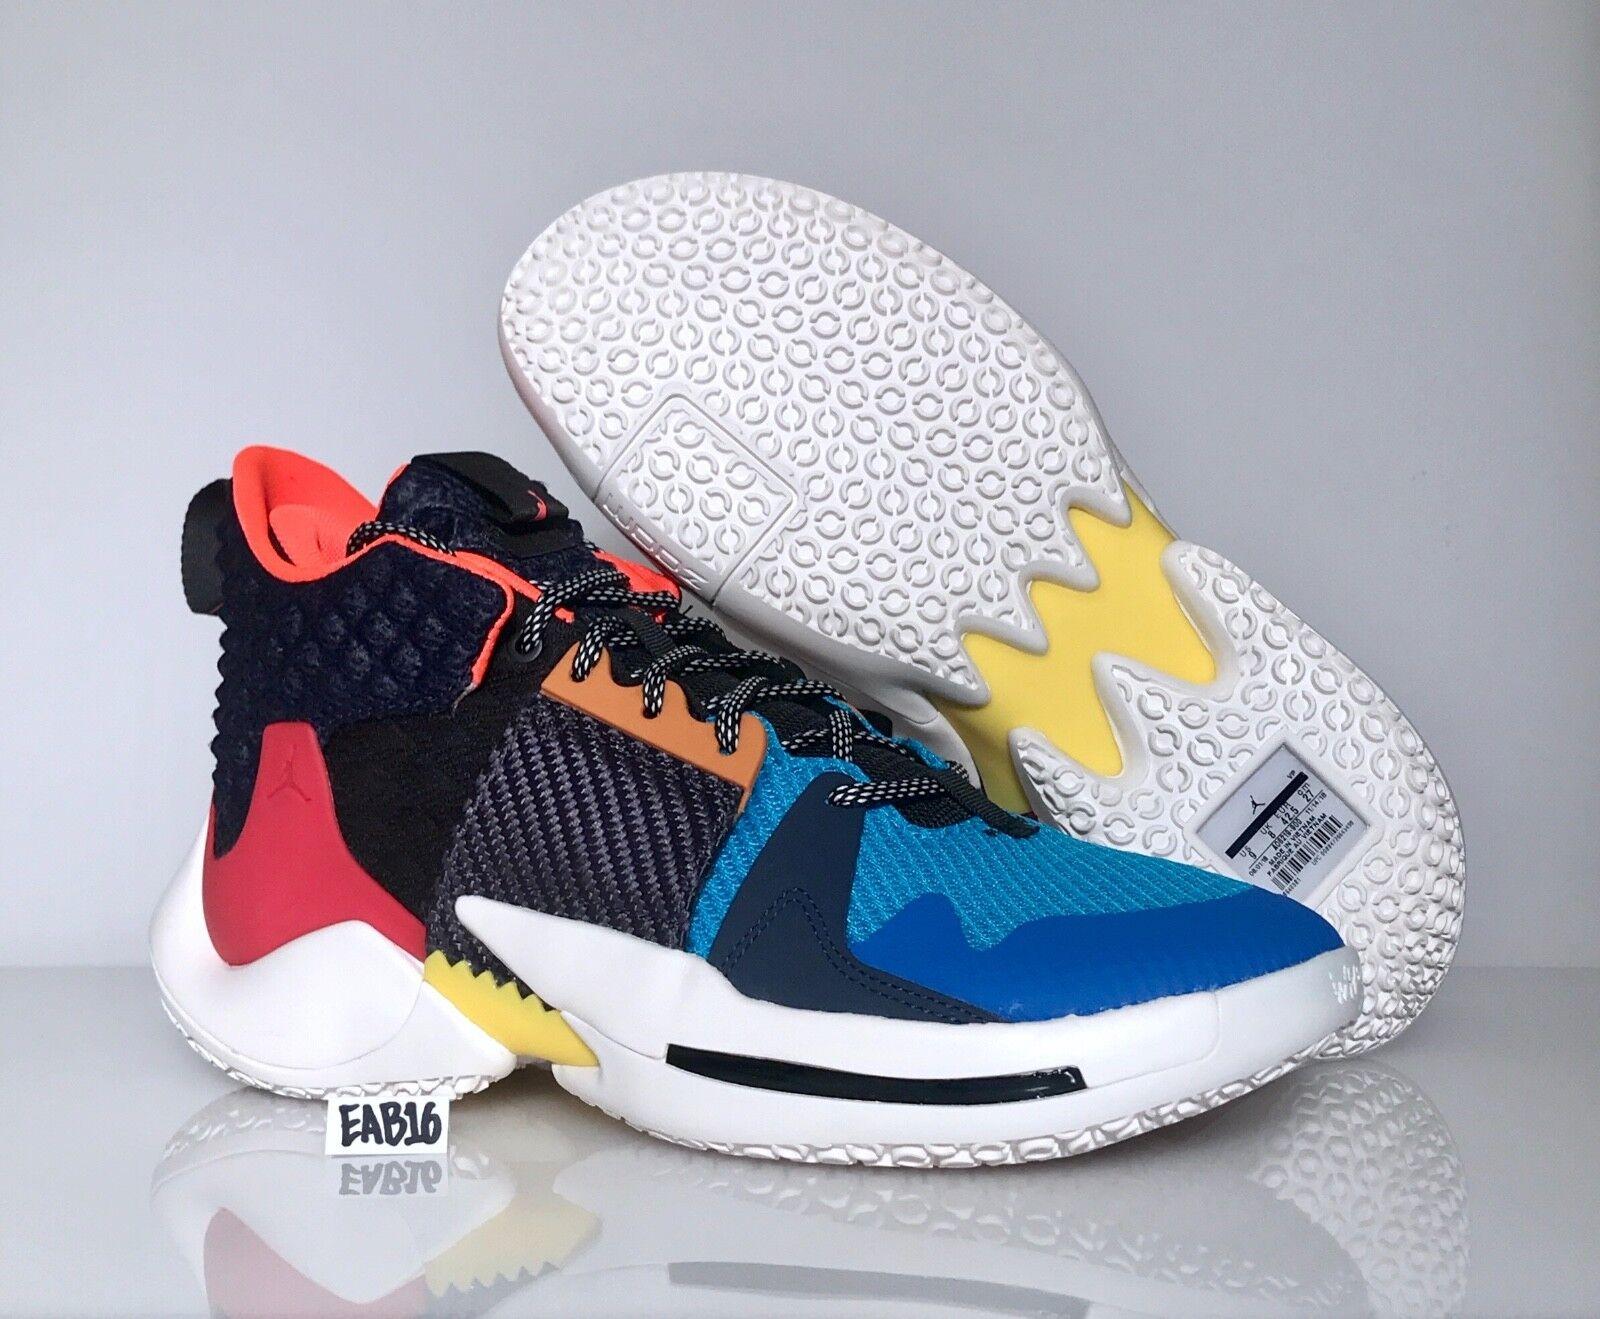 Air Jordan Russell Westbrook Future History Why Not Zer0.2 Zero.2 Zero.2 Zero.2 AO6219 900 2.0 a50573